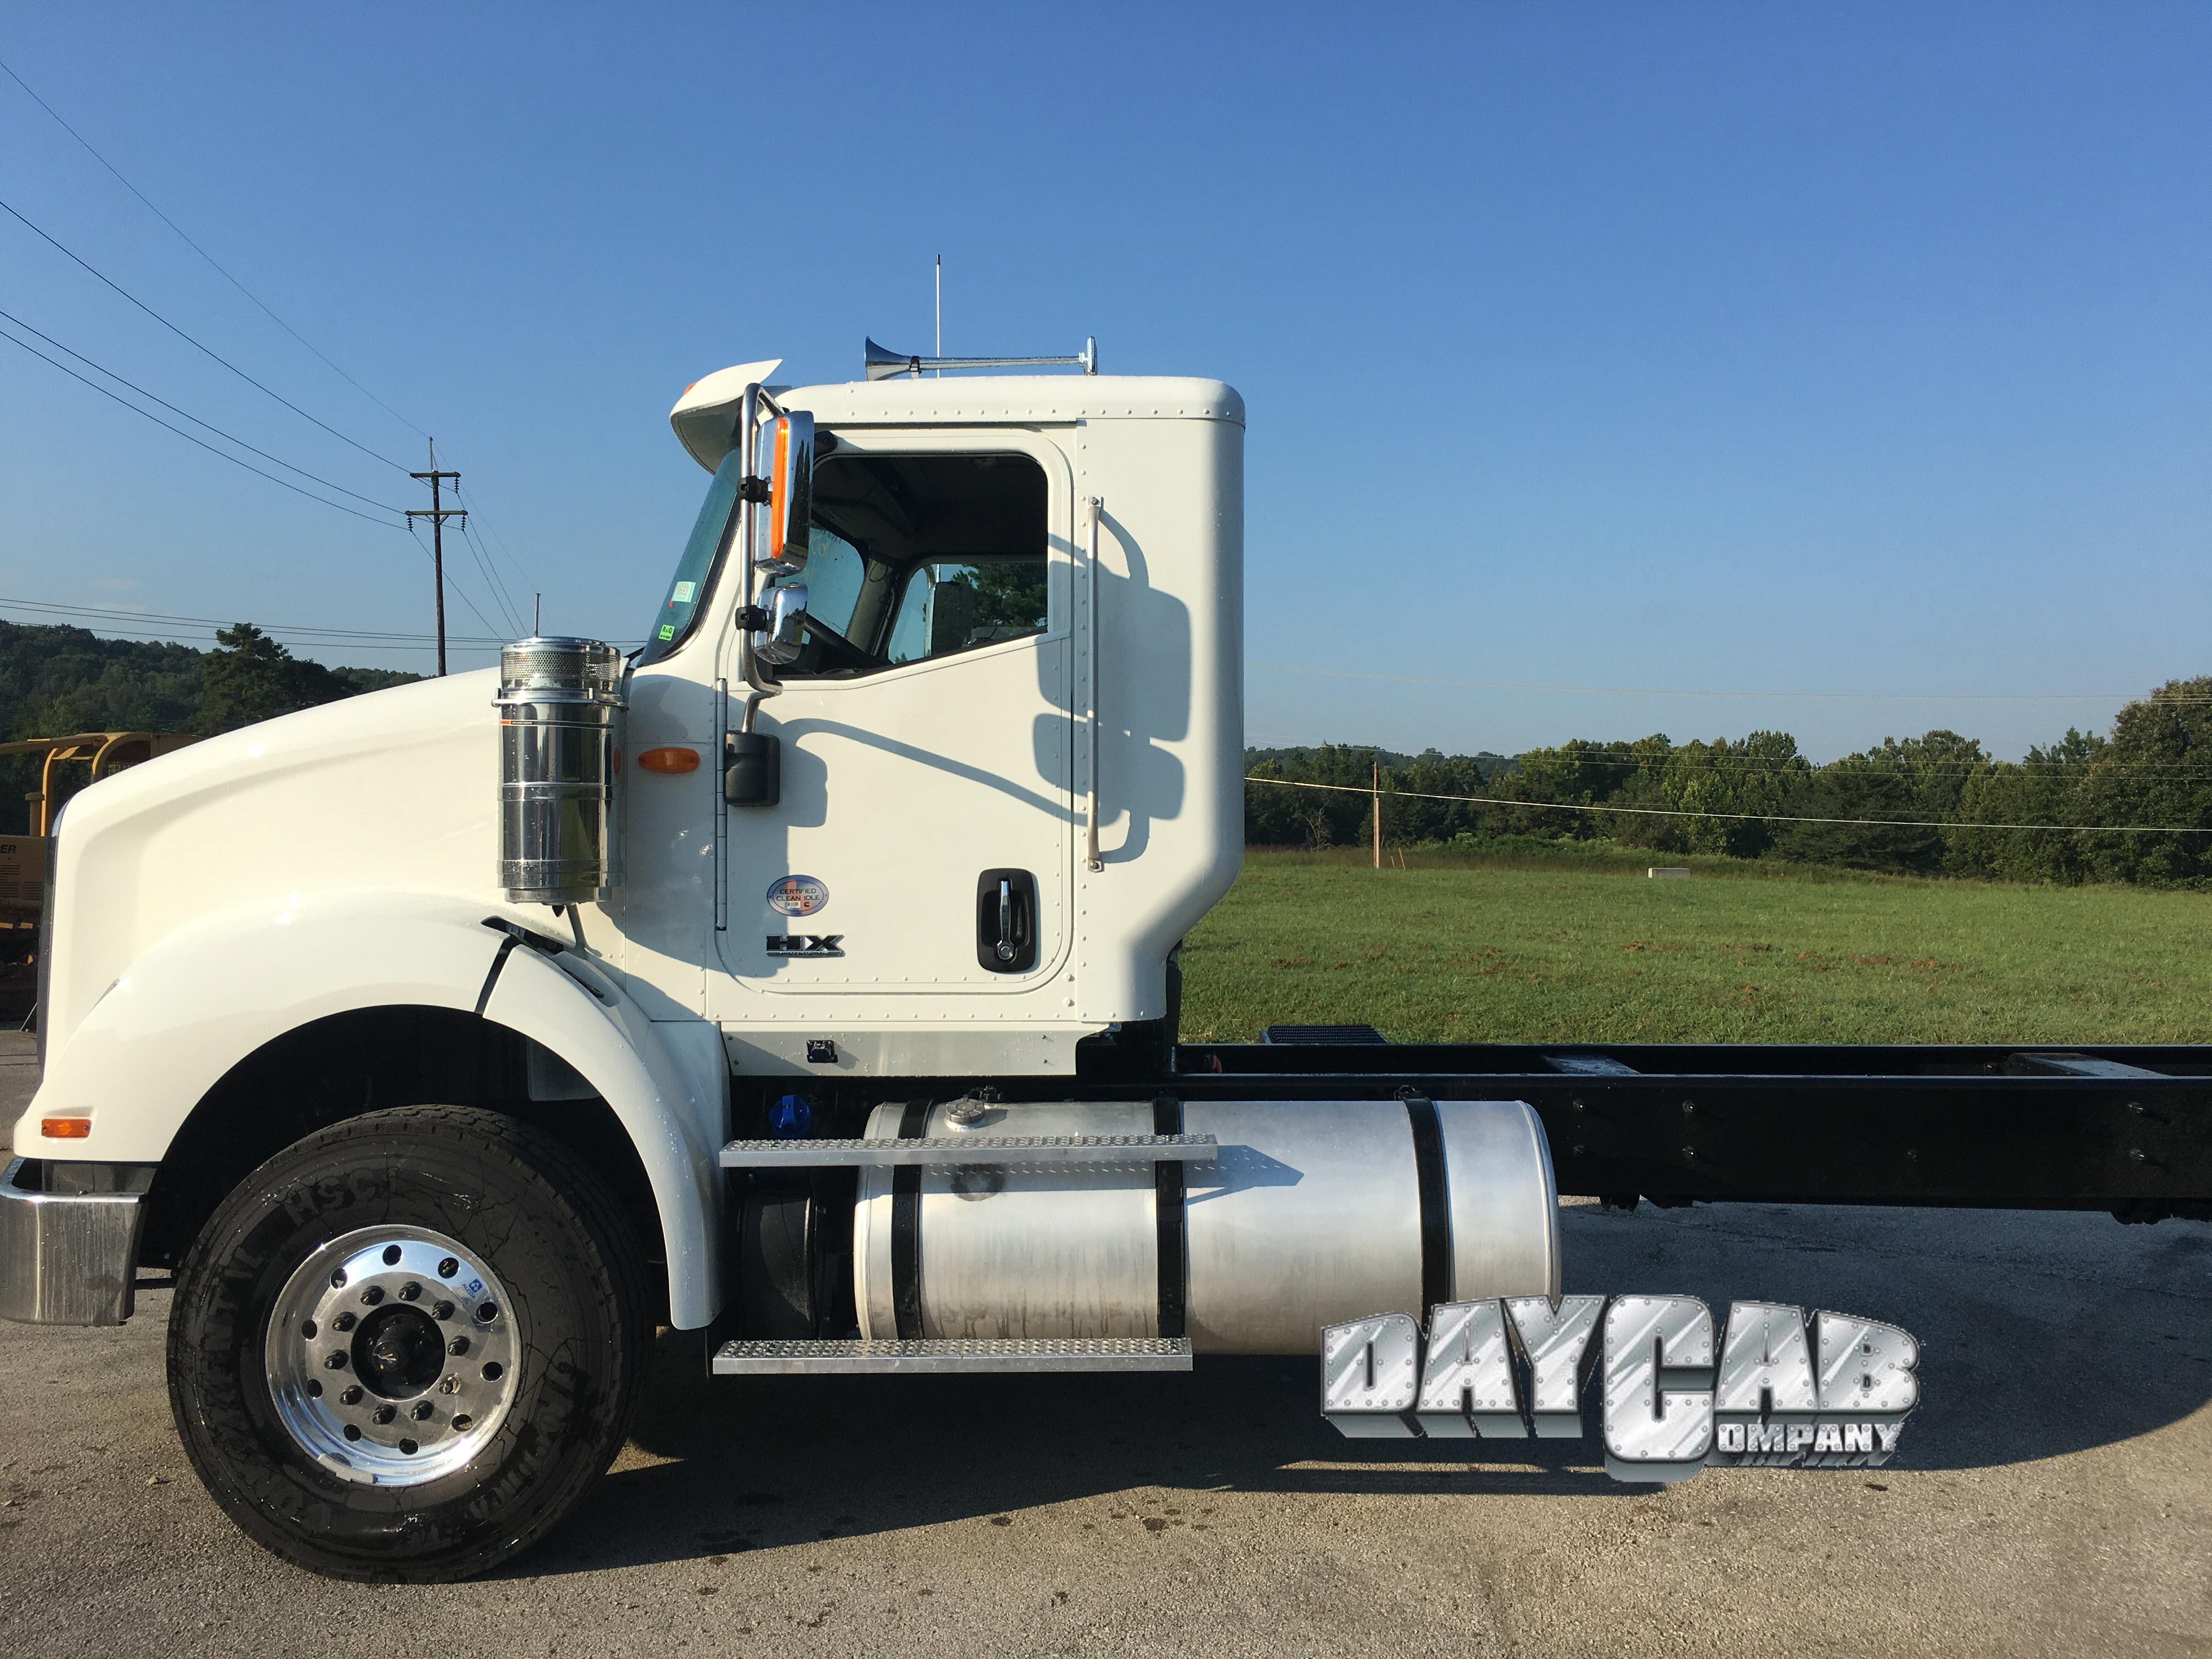 International HX 620 Megacab Day Cab - Daycab Company